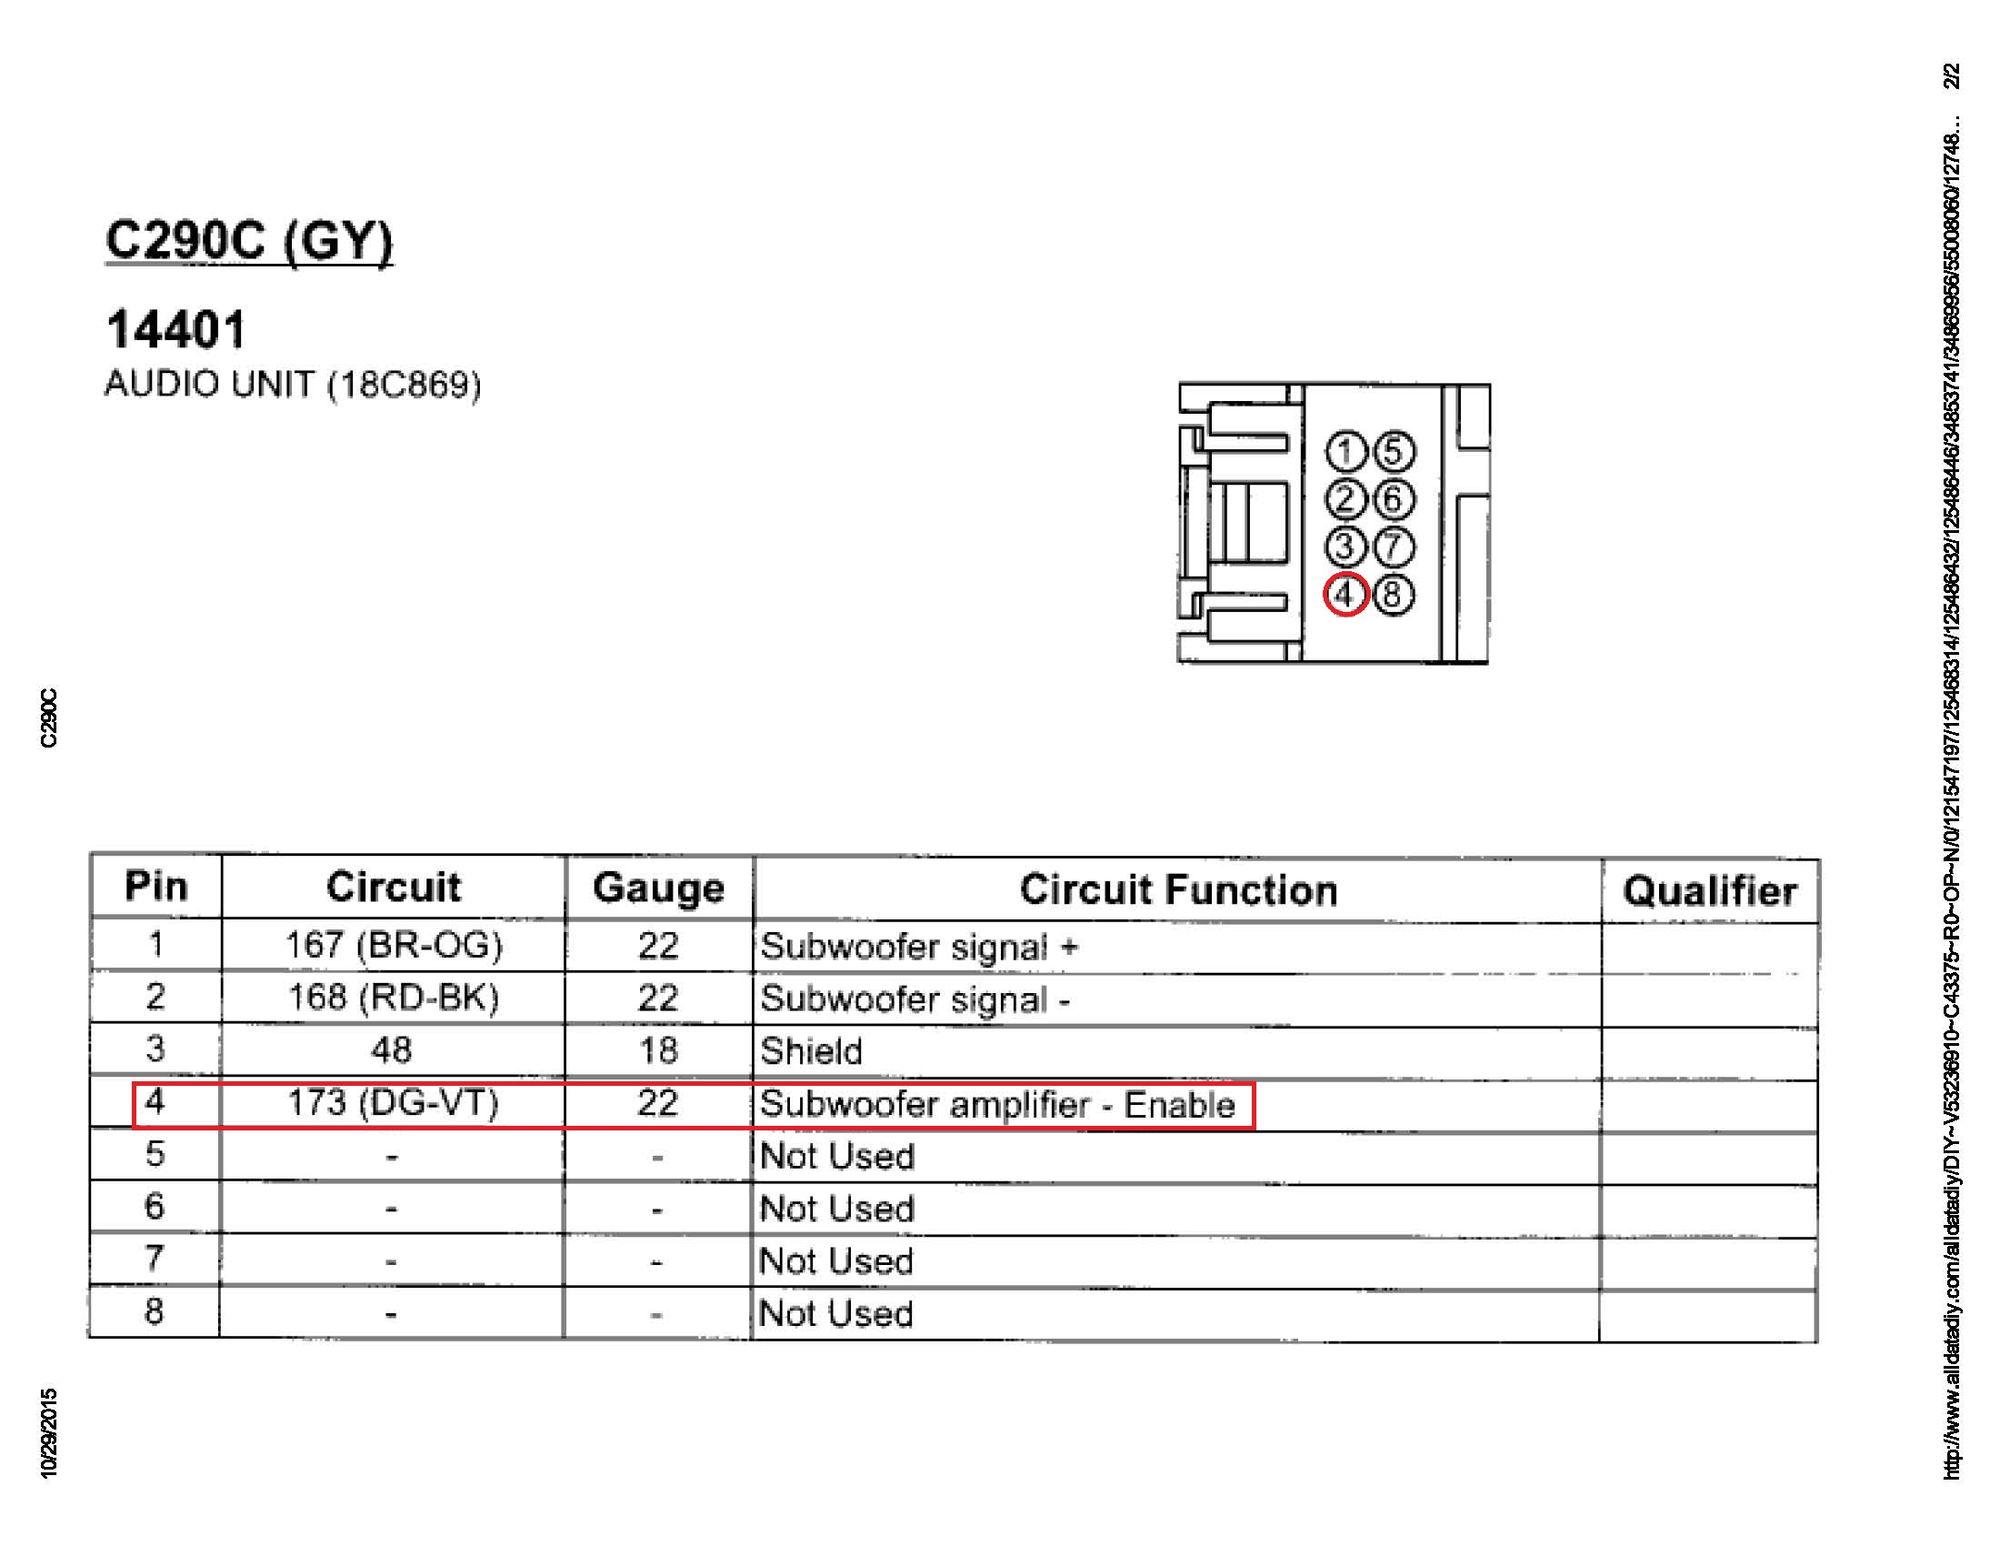 80 c290c_subplghu_d85ed382328ff6386a3184654777ba4d6b199319?resize=665%2C514&ssl=1 metra 70 5521 wiring diagram metra wiring diagrams collection  at crackthecode.co